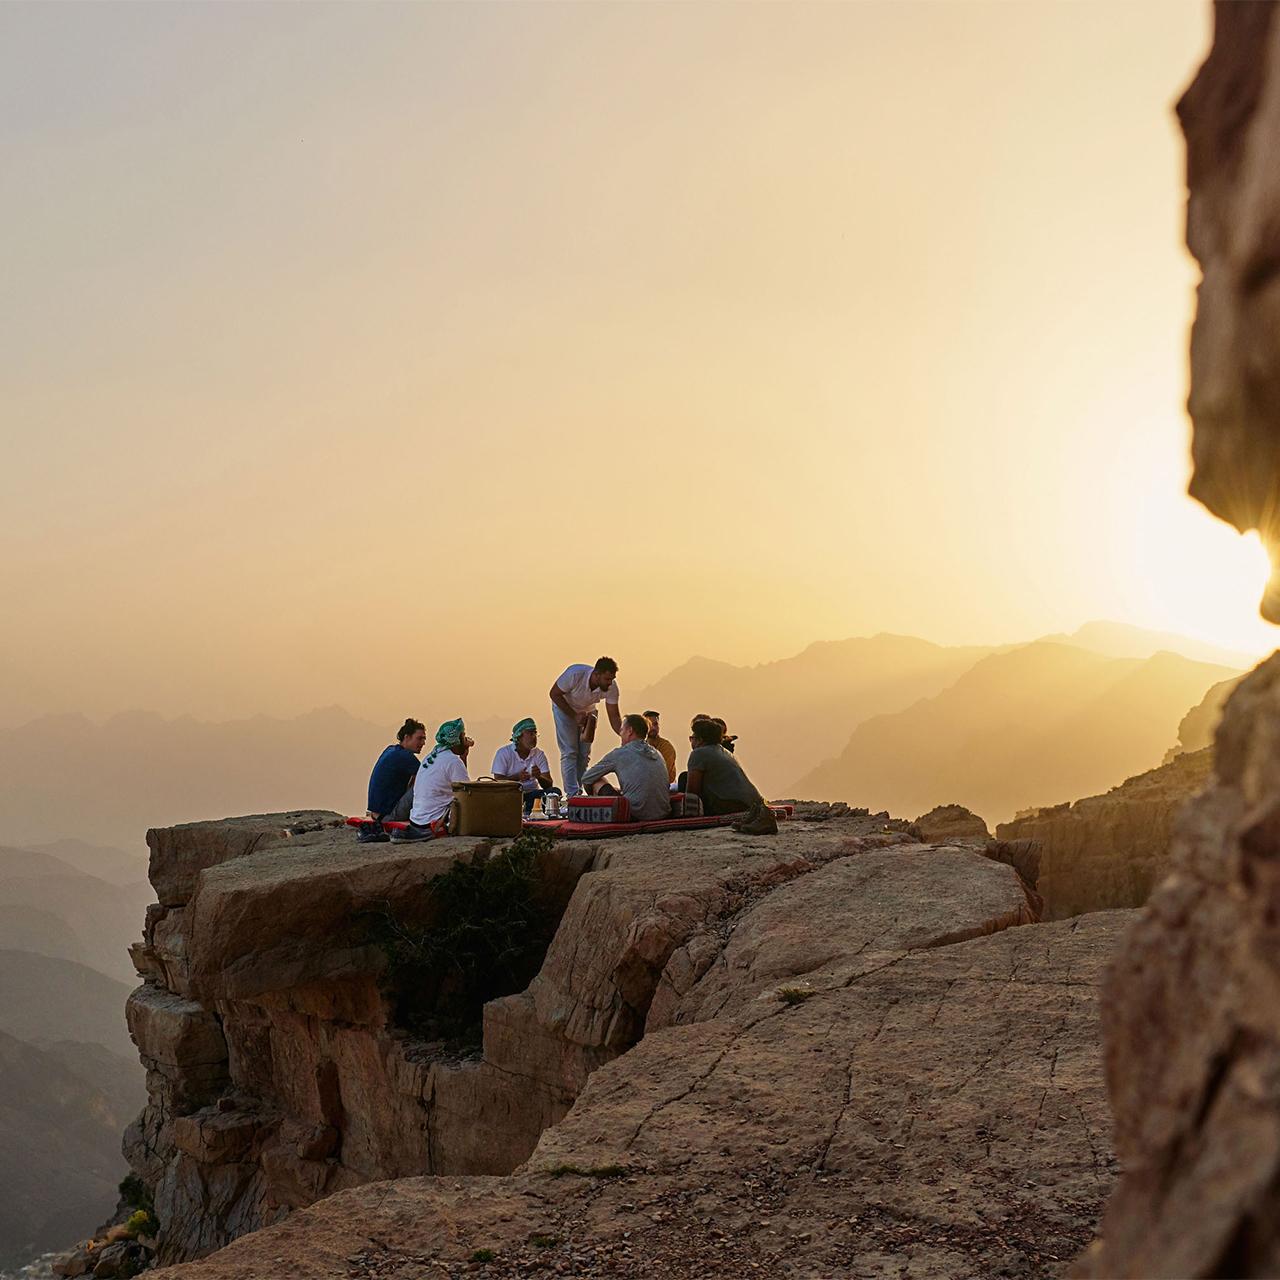 mountain dinner in a desert in Oman